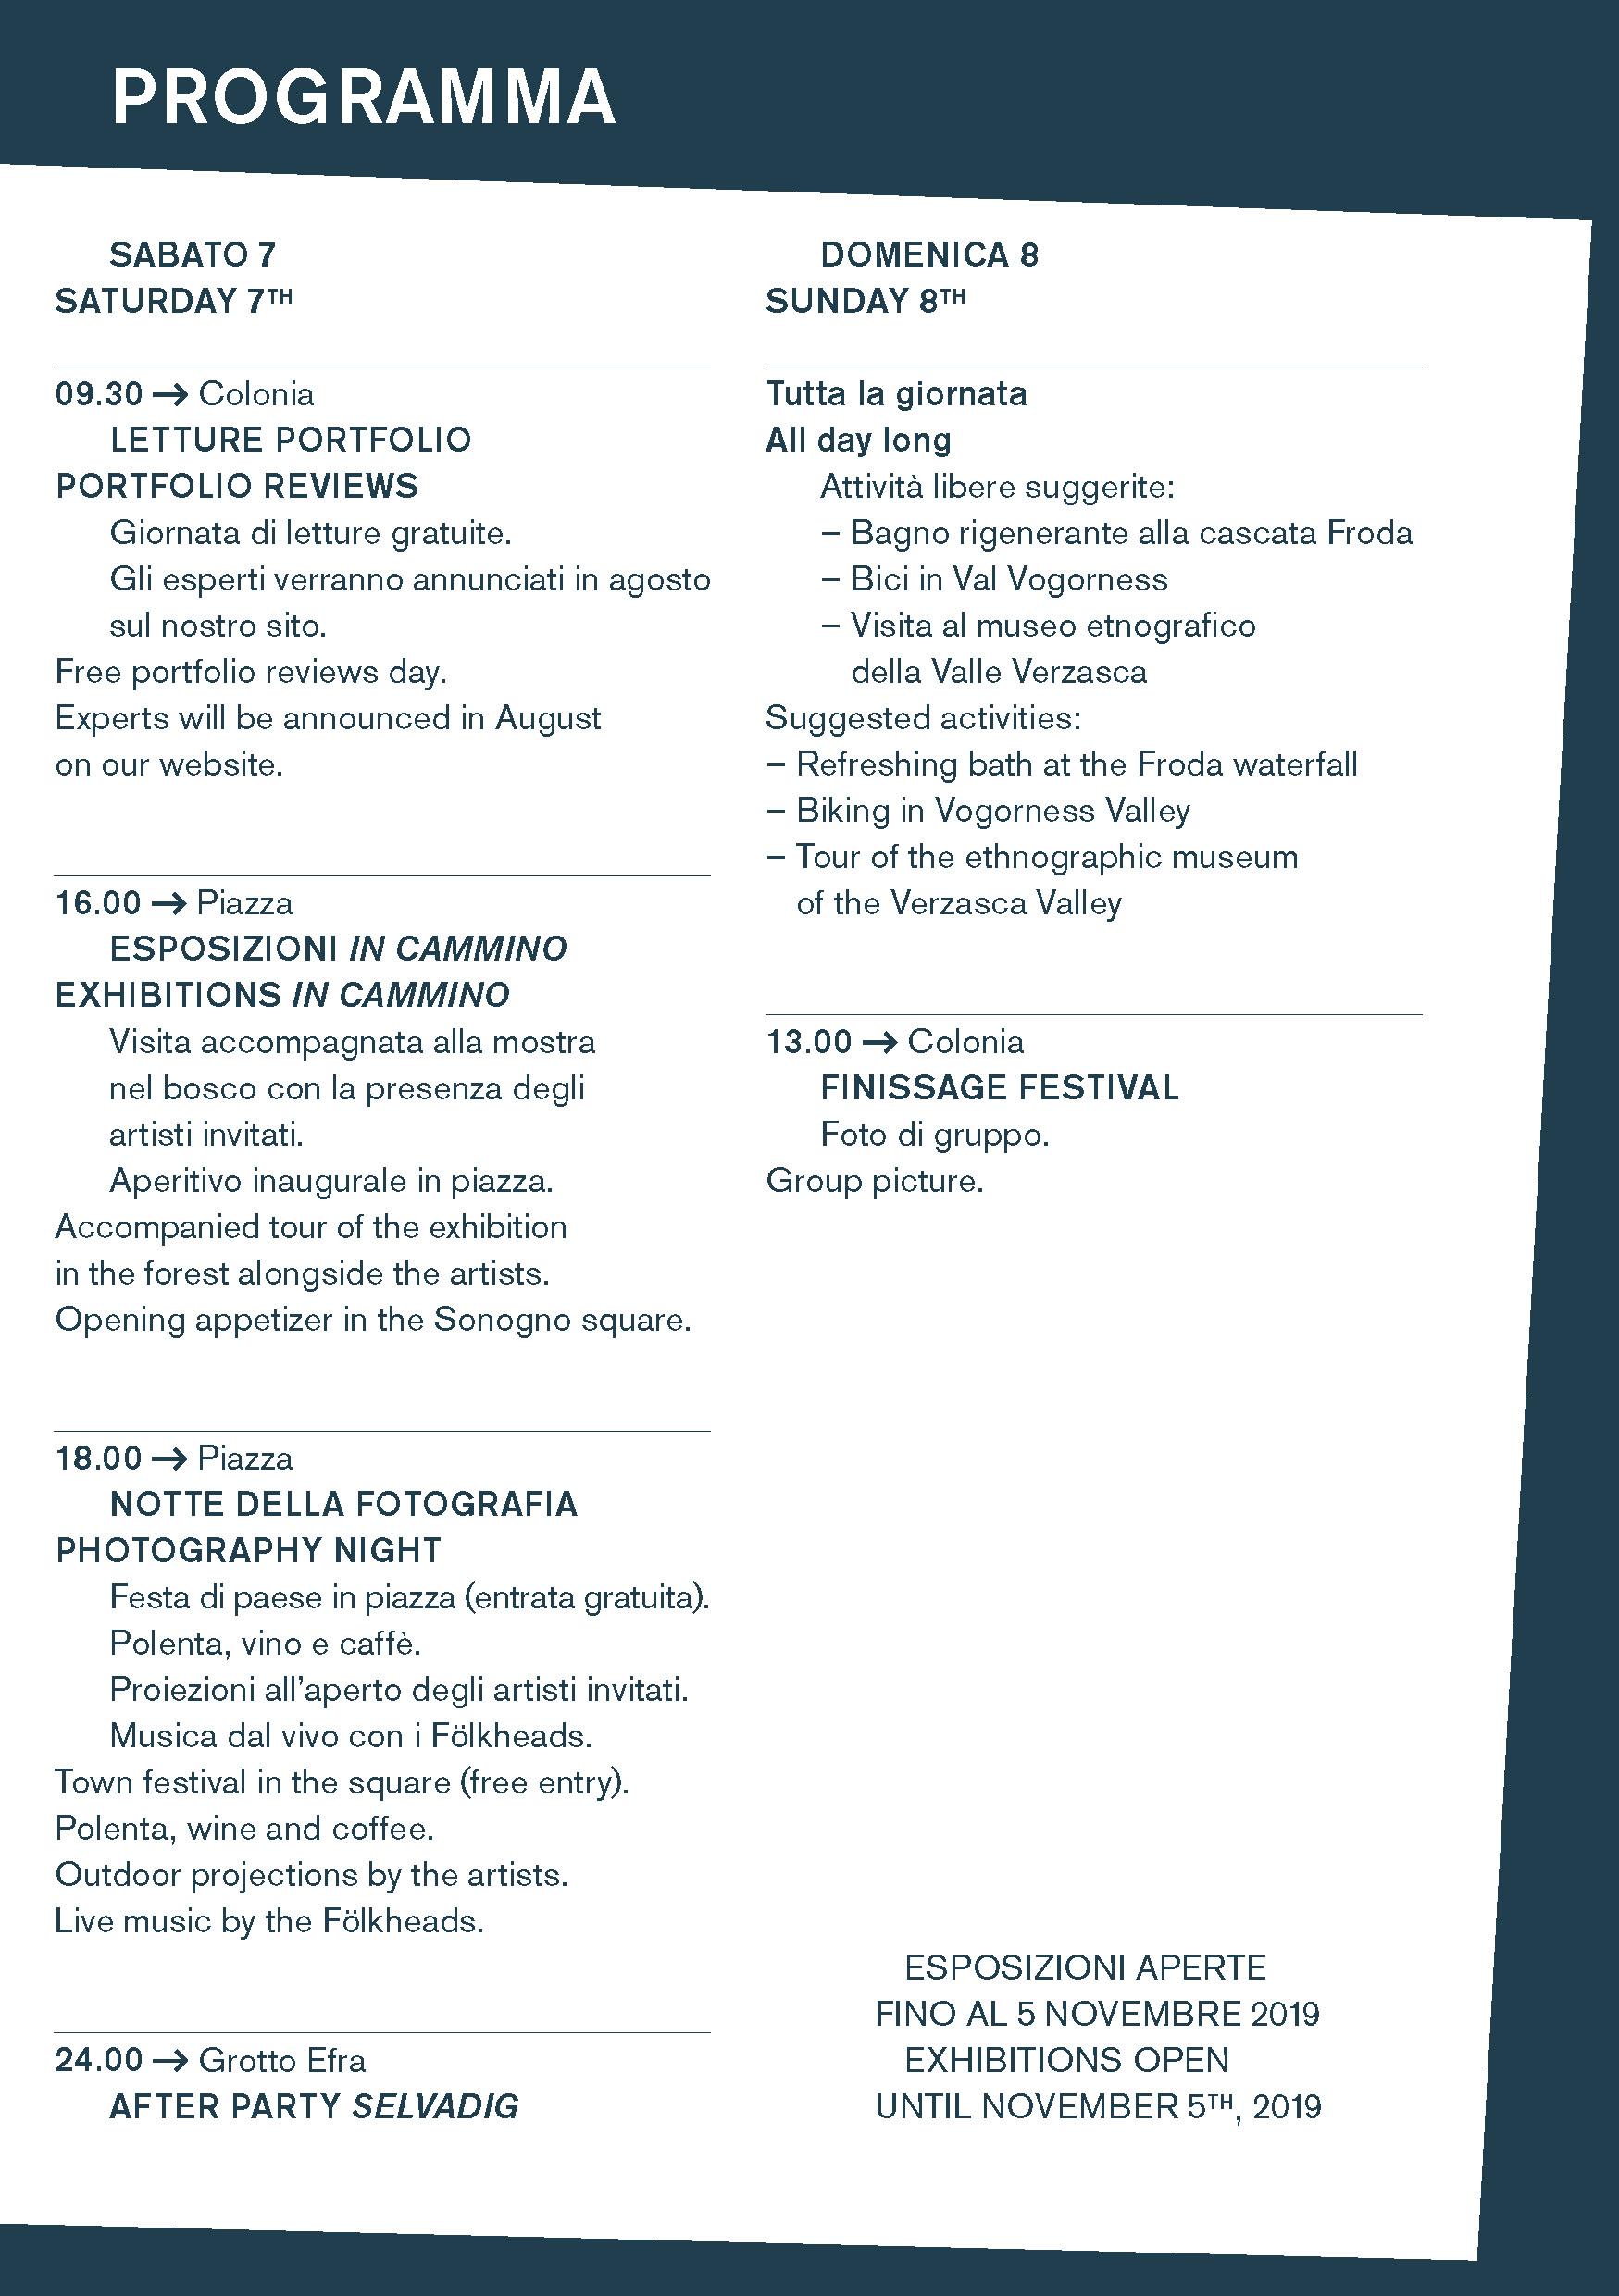 Verzasca Foto Festival - Programma 2019 7.jpg